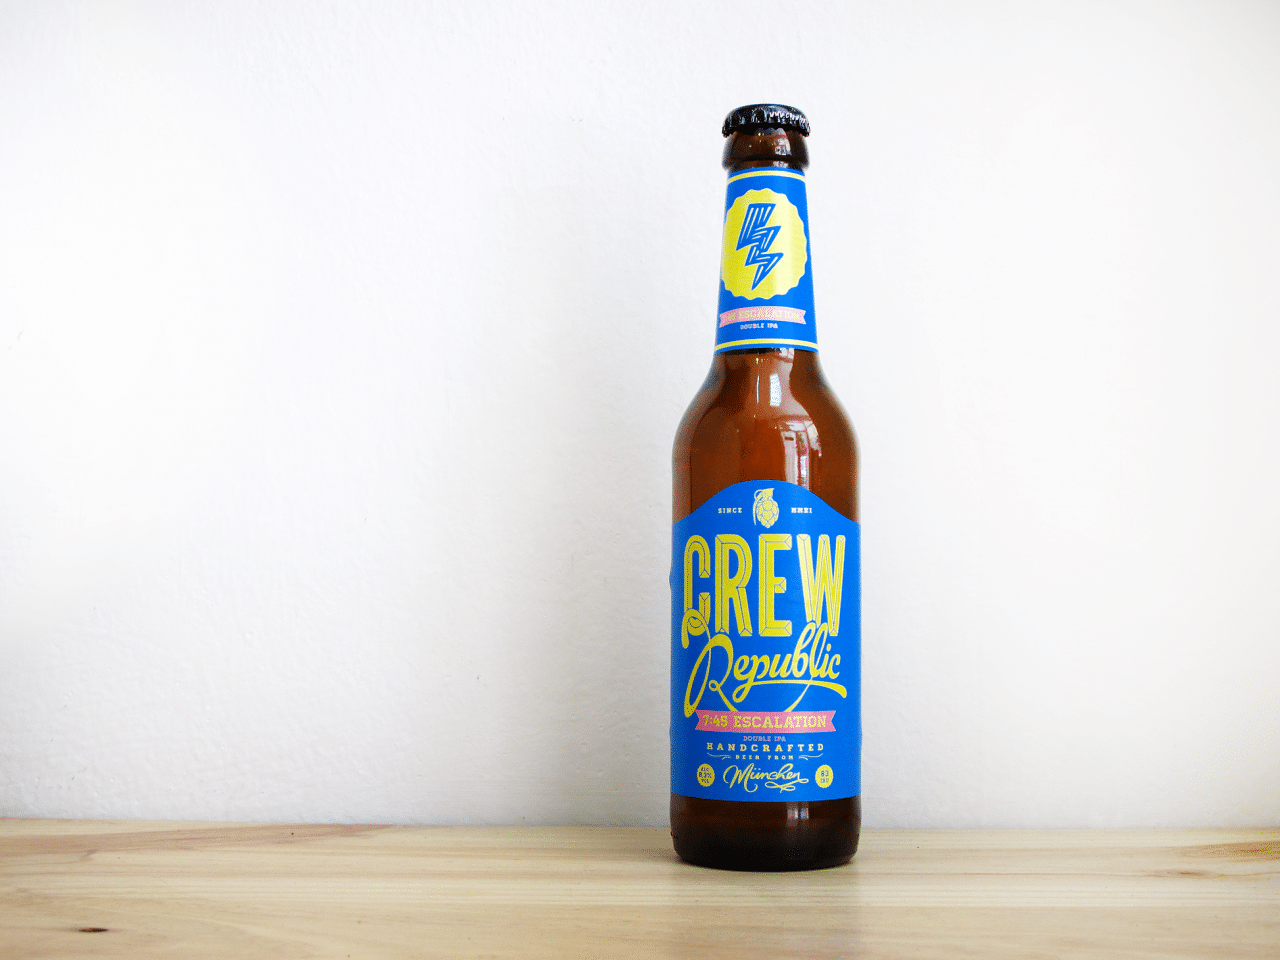 Cerveza CREW Republic 7:45 Escalation - IPA